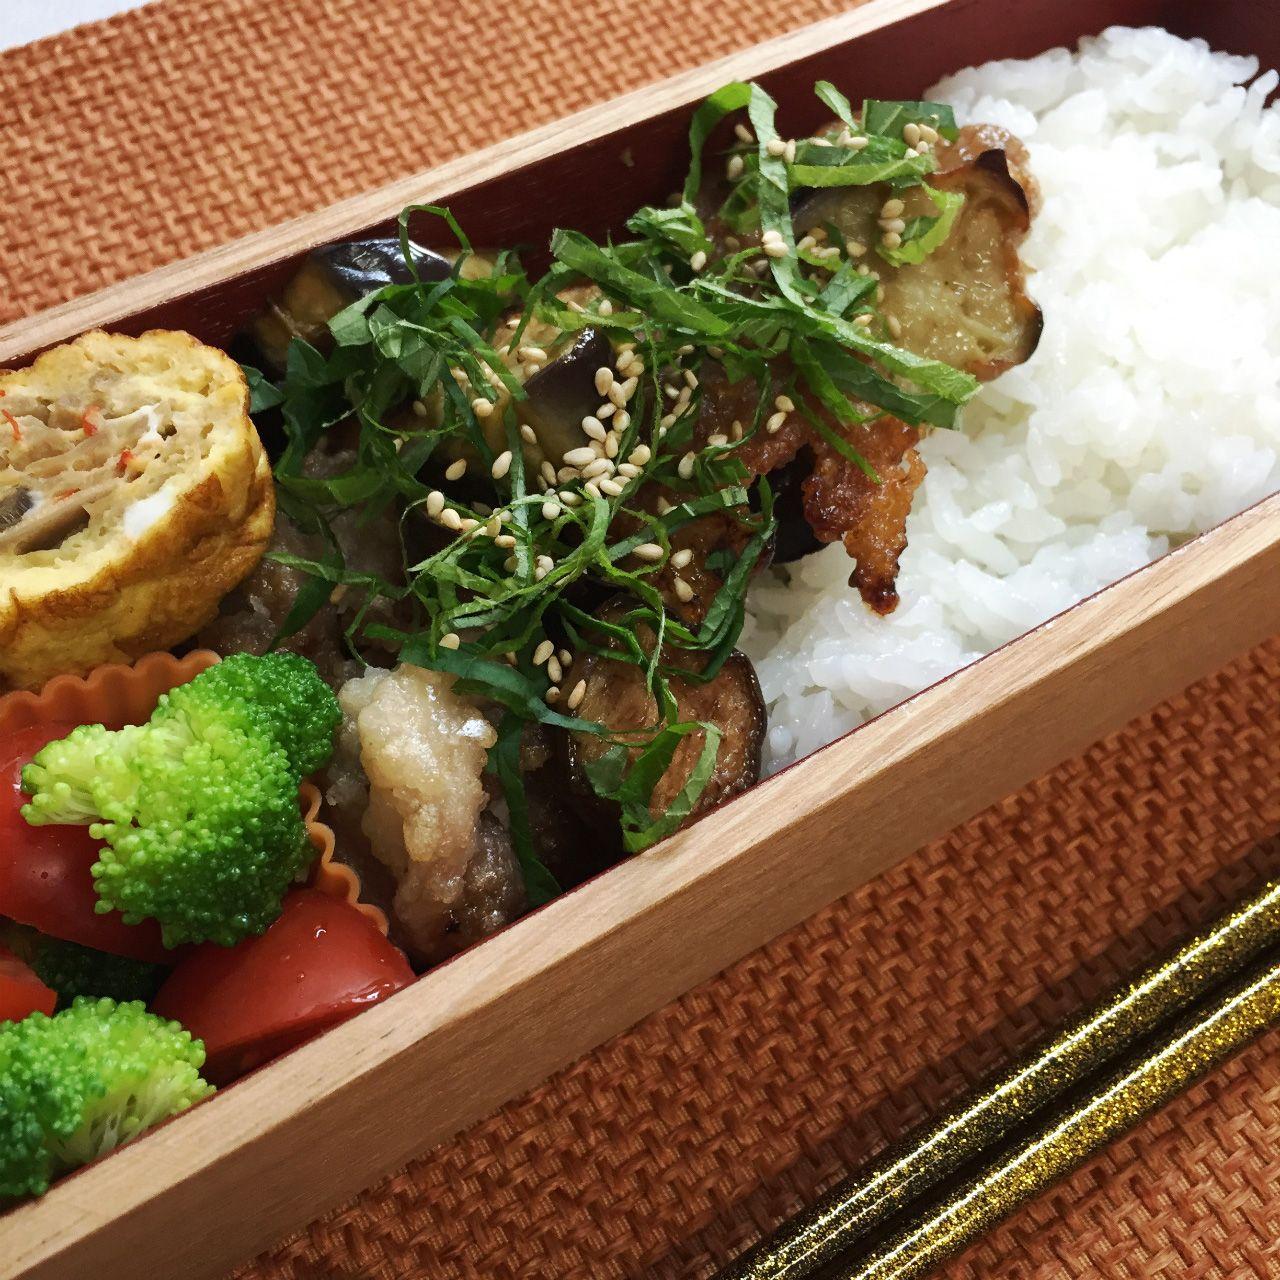 Deep-fried pork & eggplants marinated in ponzu sauce